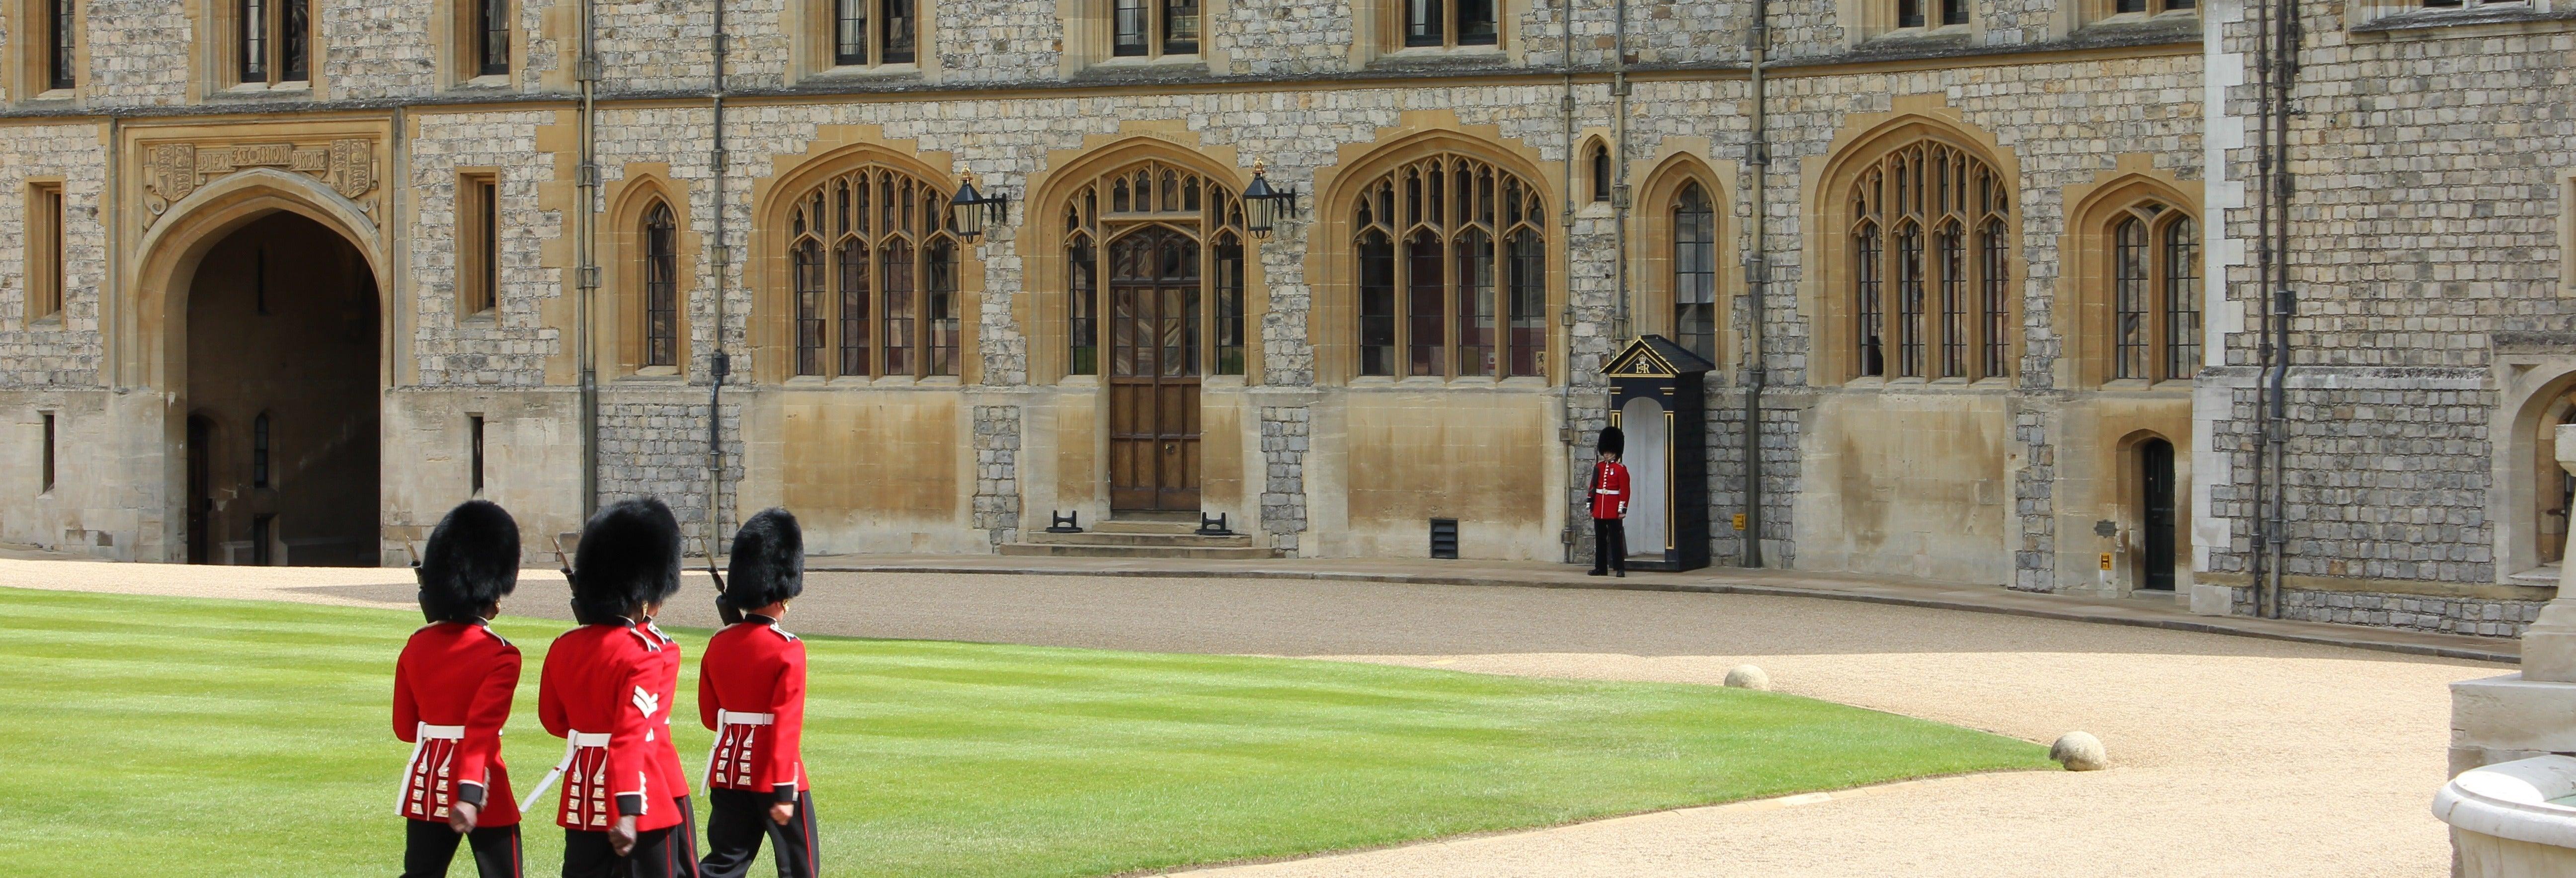 Ônibus turístico de Windsor